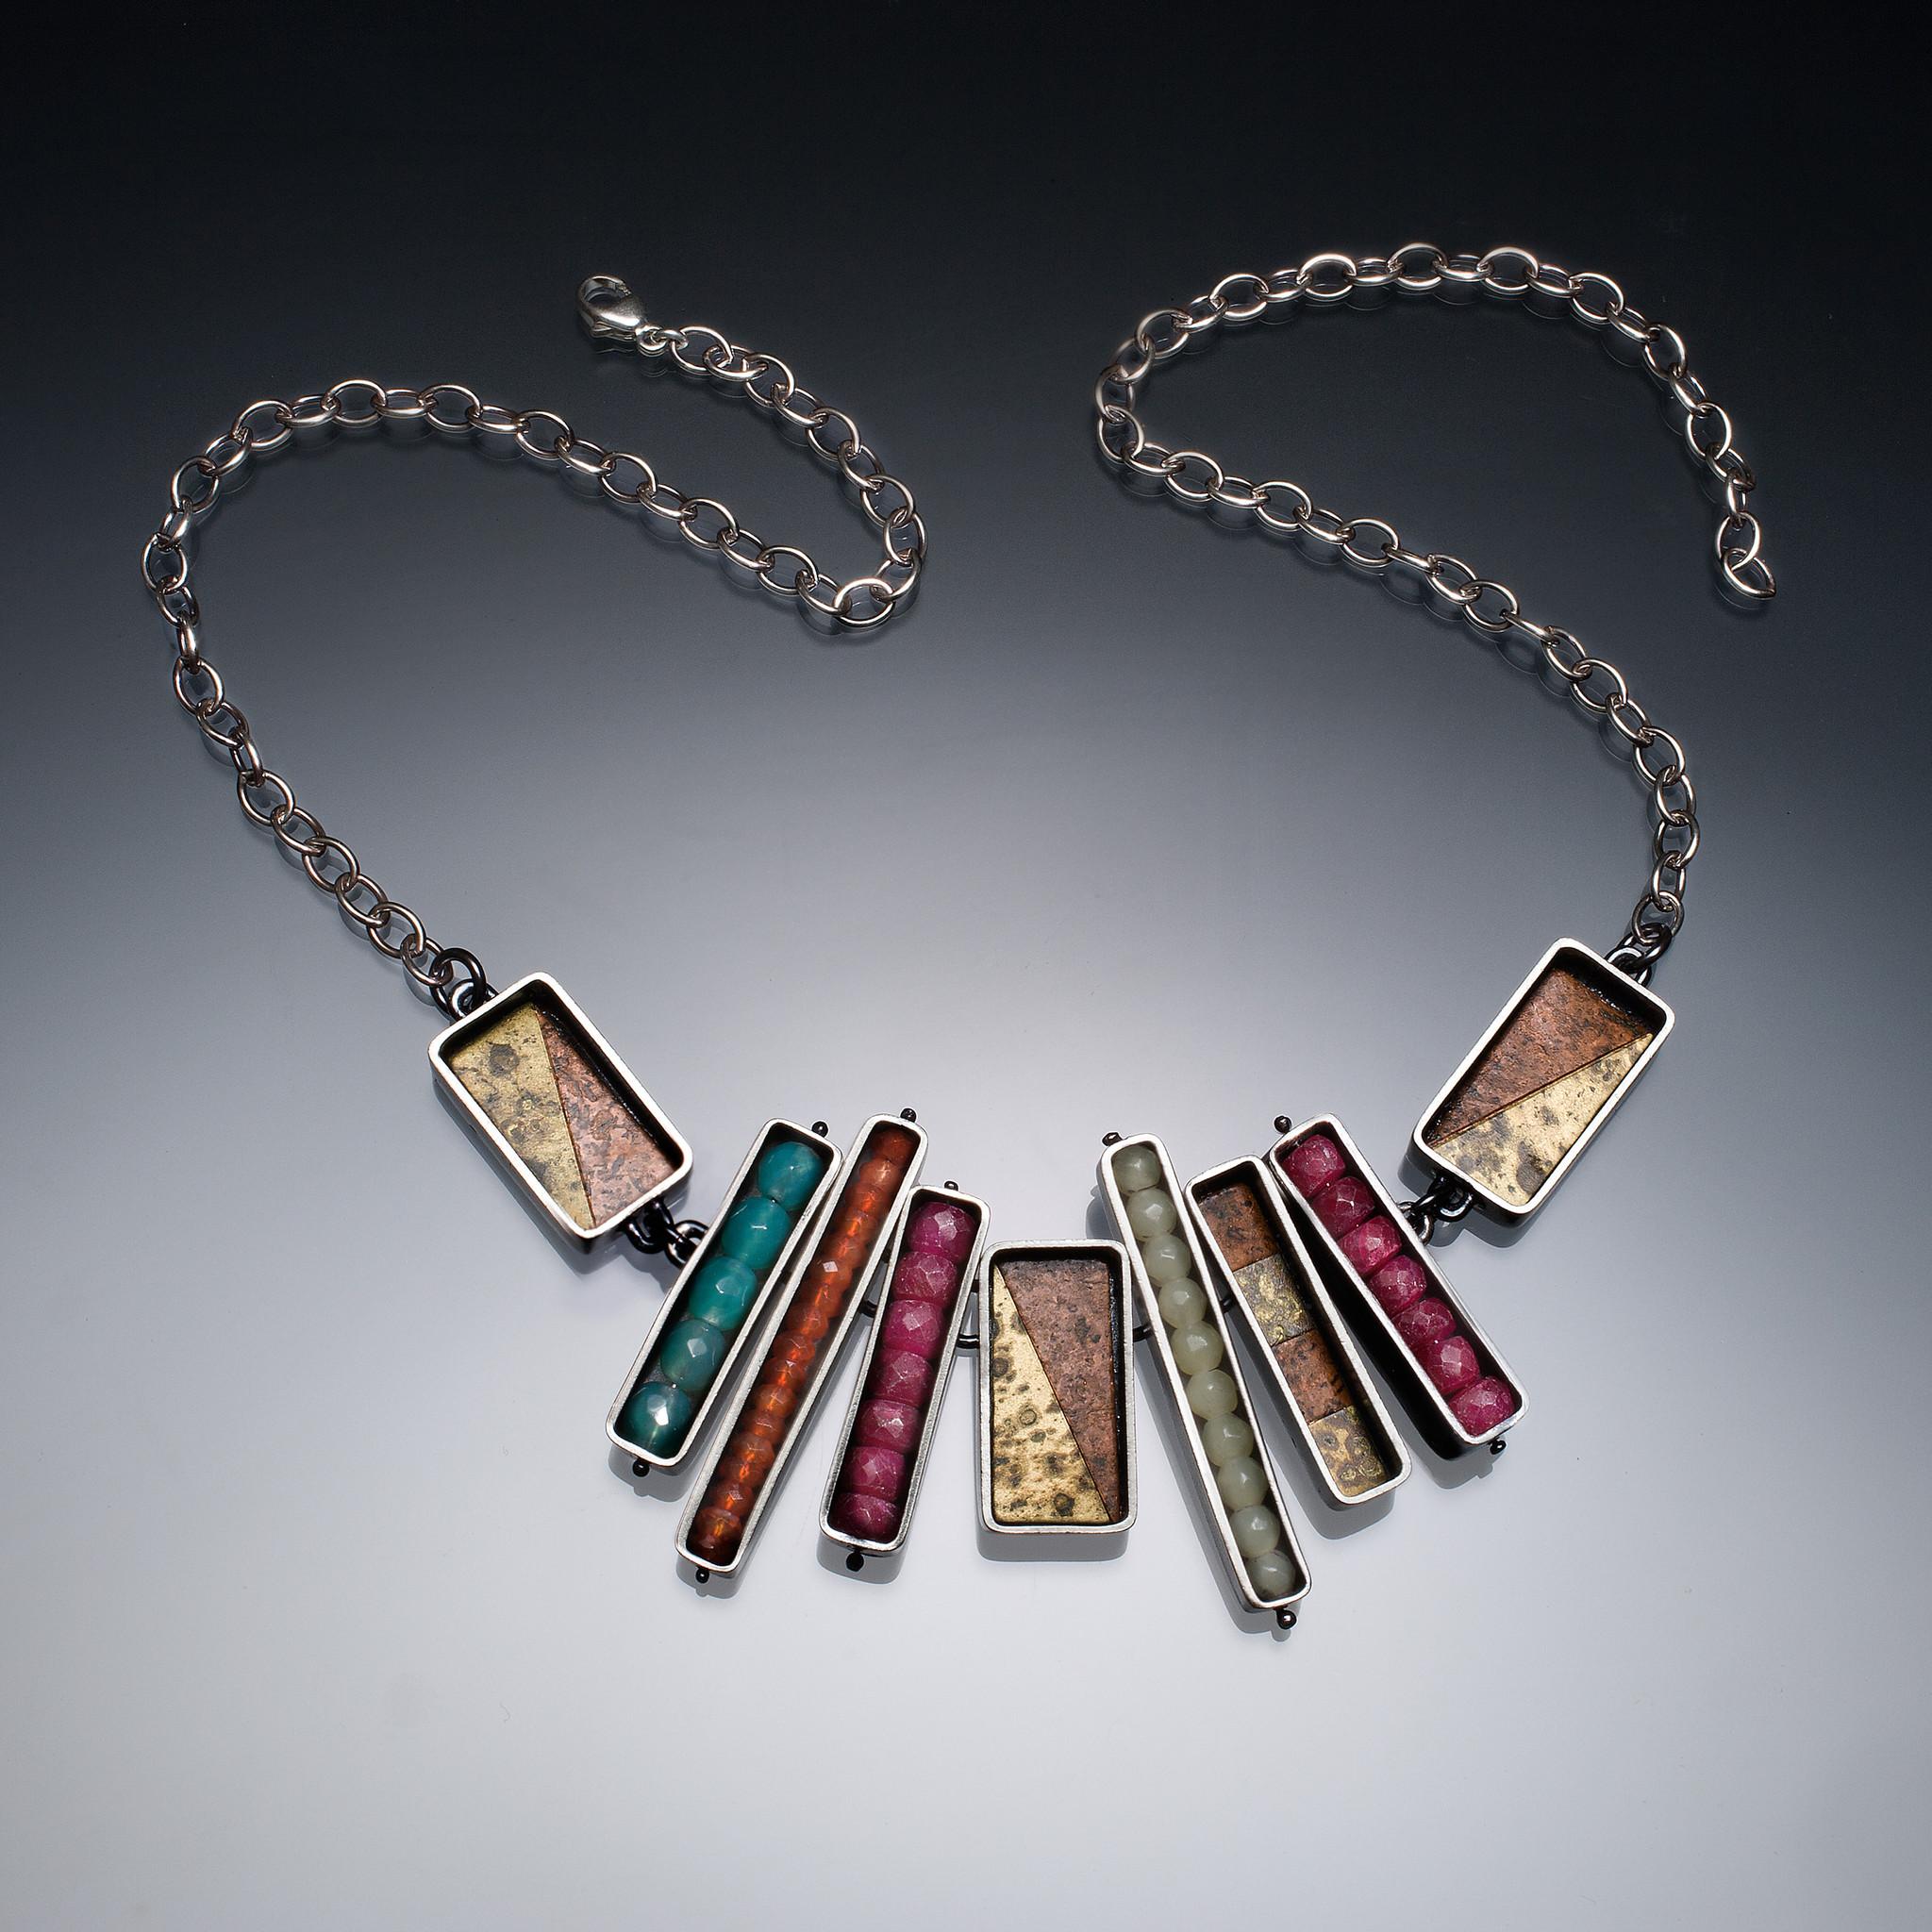 Cobblestone_necklace_2275x2275.jpg